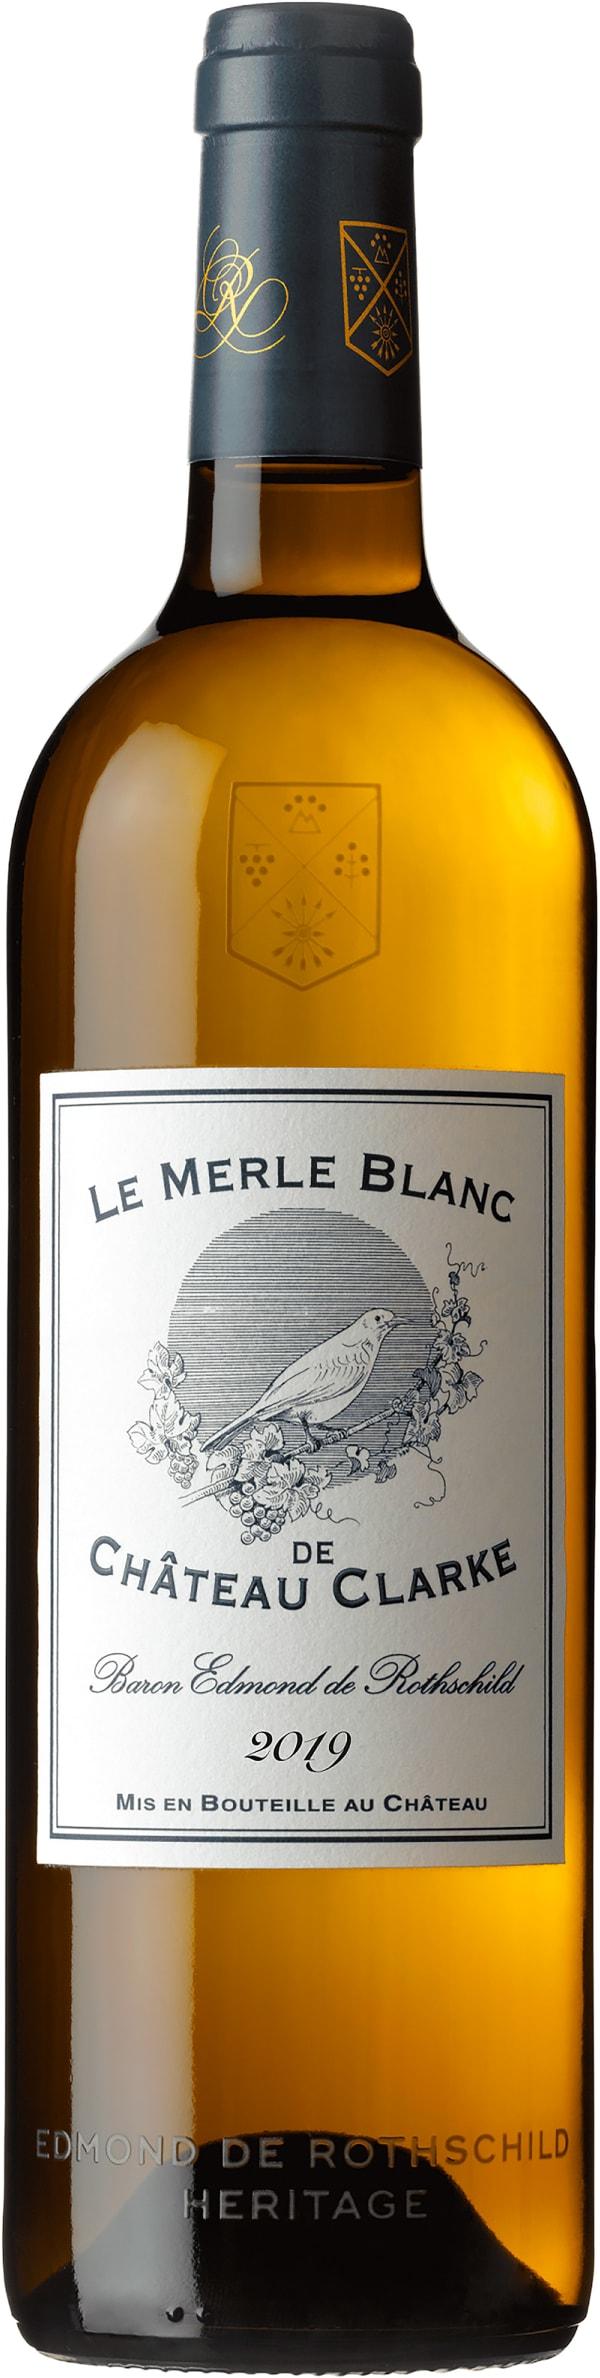 Chateau Clarke La Merle Blanc 2019